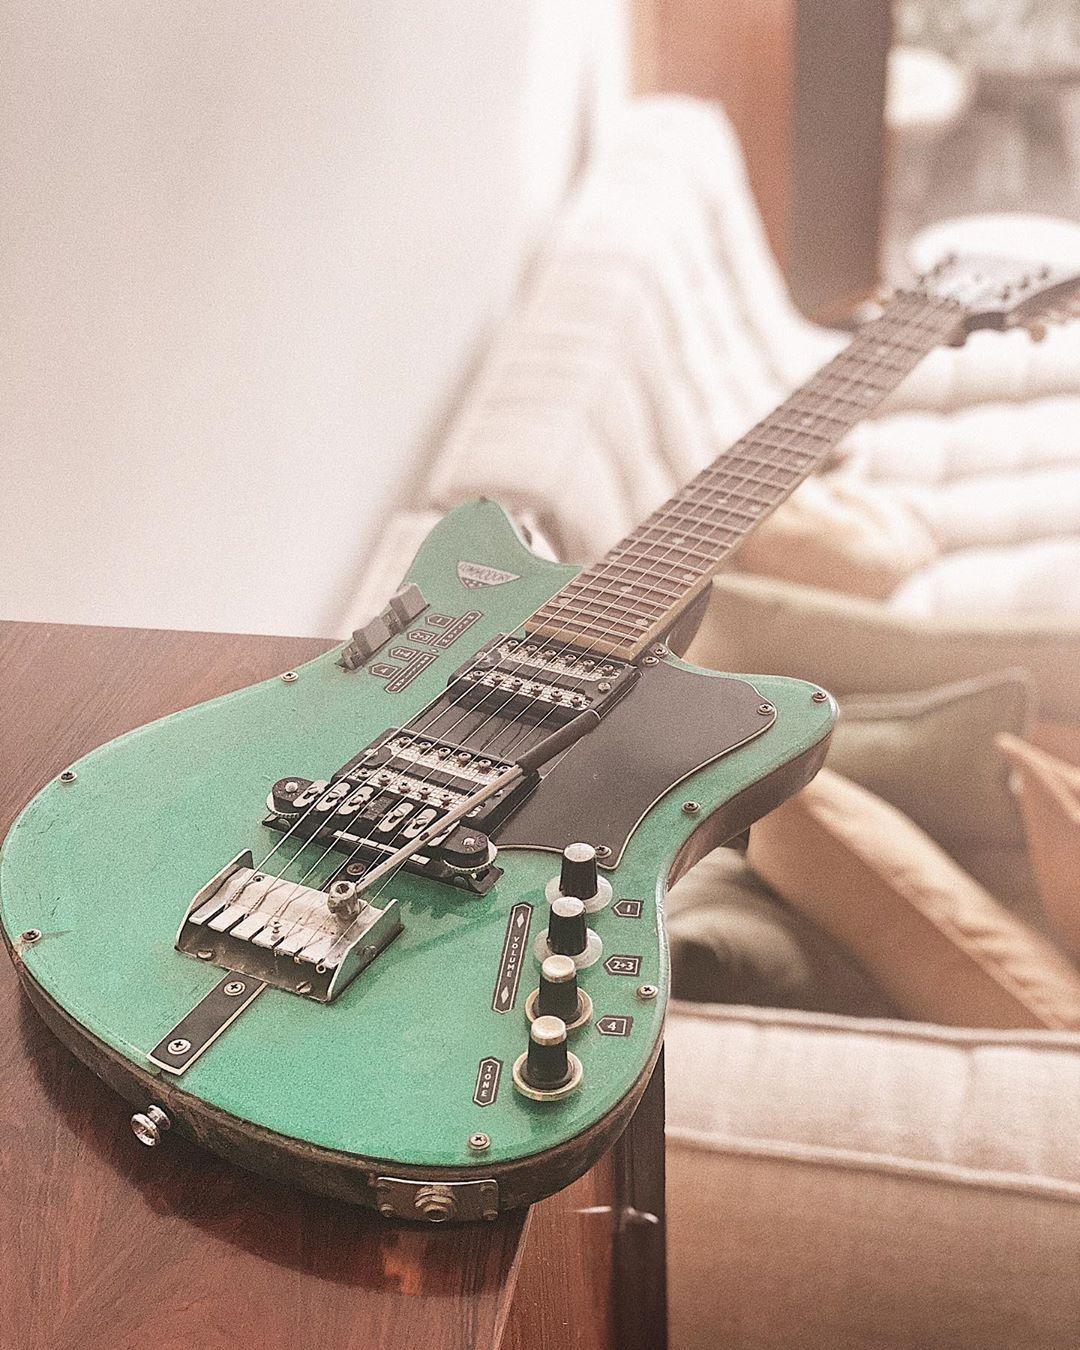 Pin By Ken Whitlock On Perfectly Good Guitars In 2020 Cool Guitar Palm Beach Sandals John Hiatt